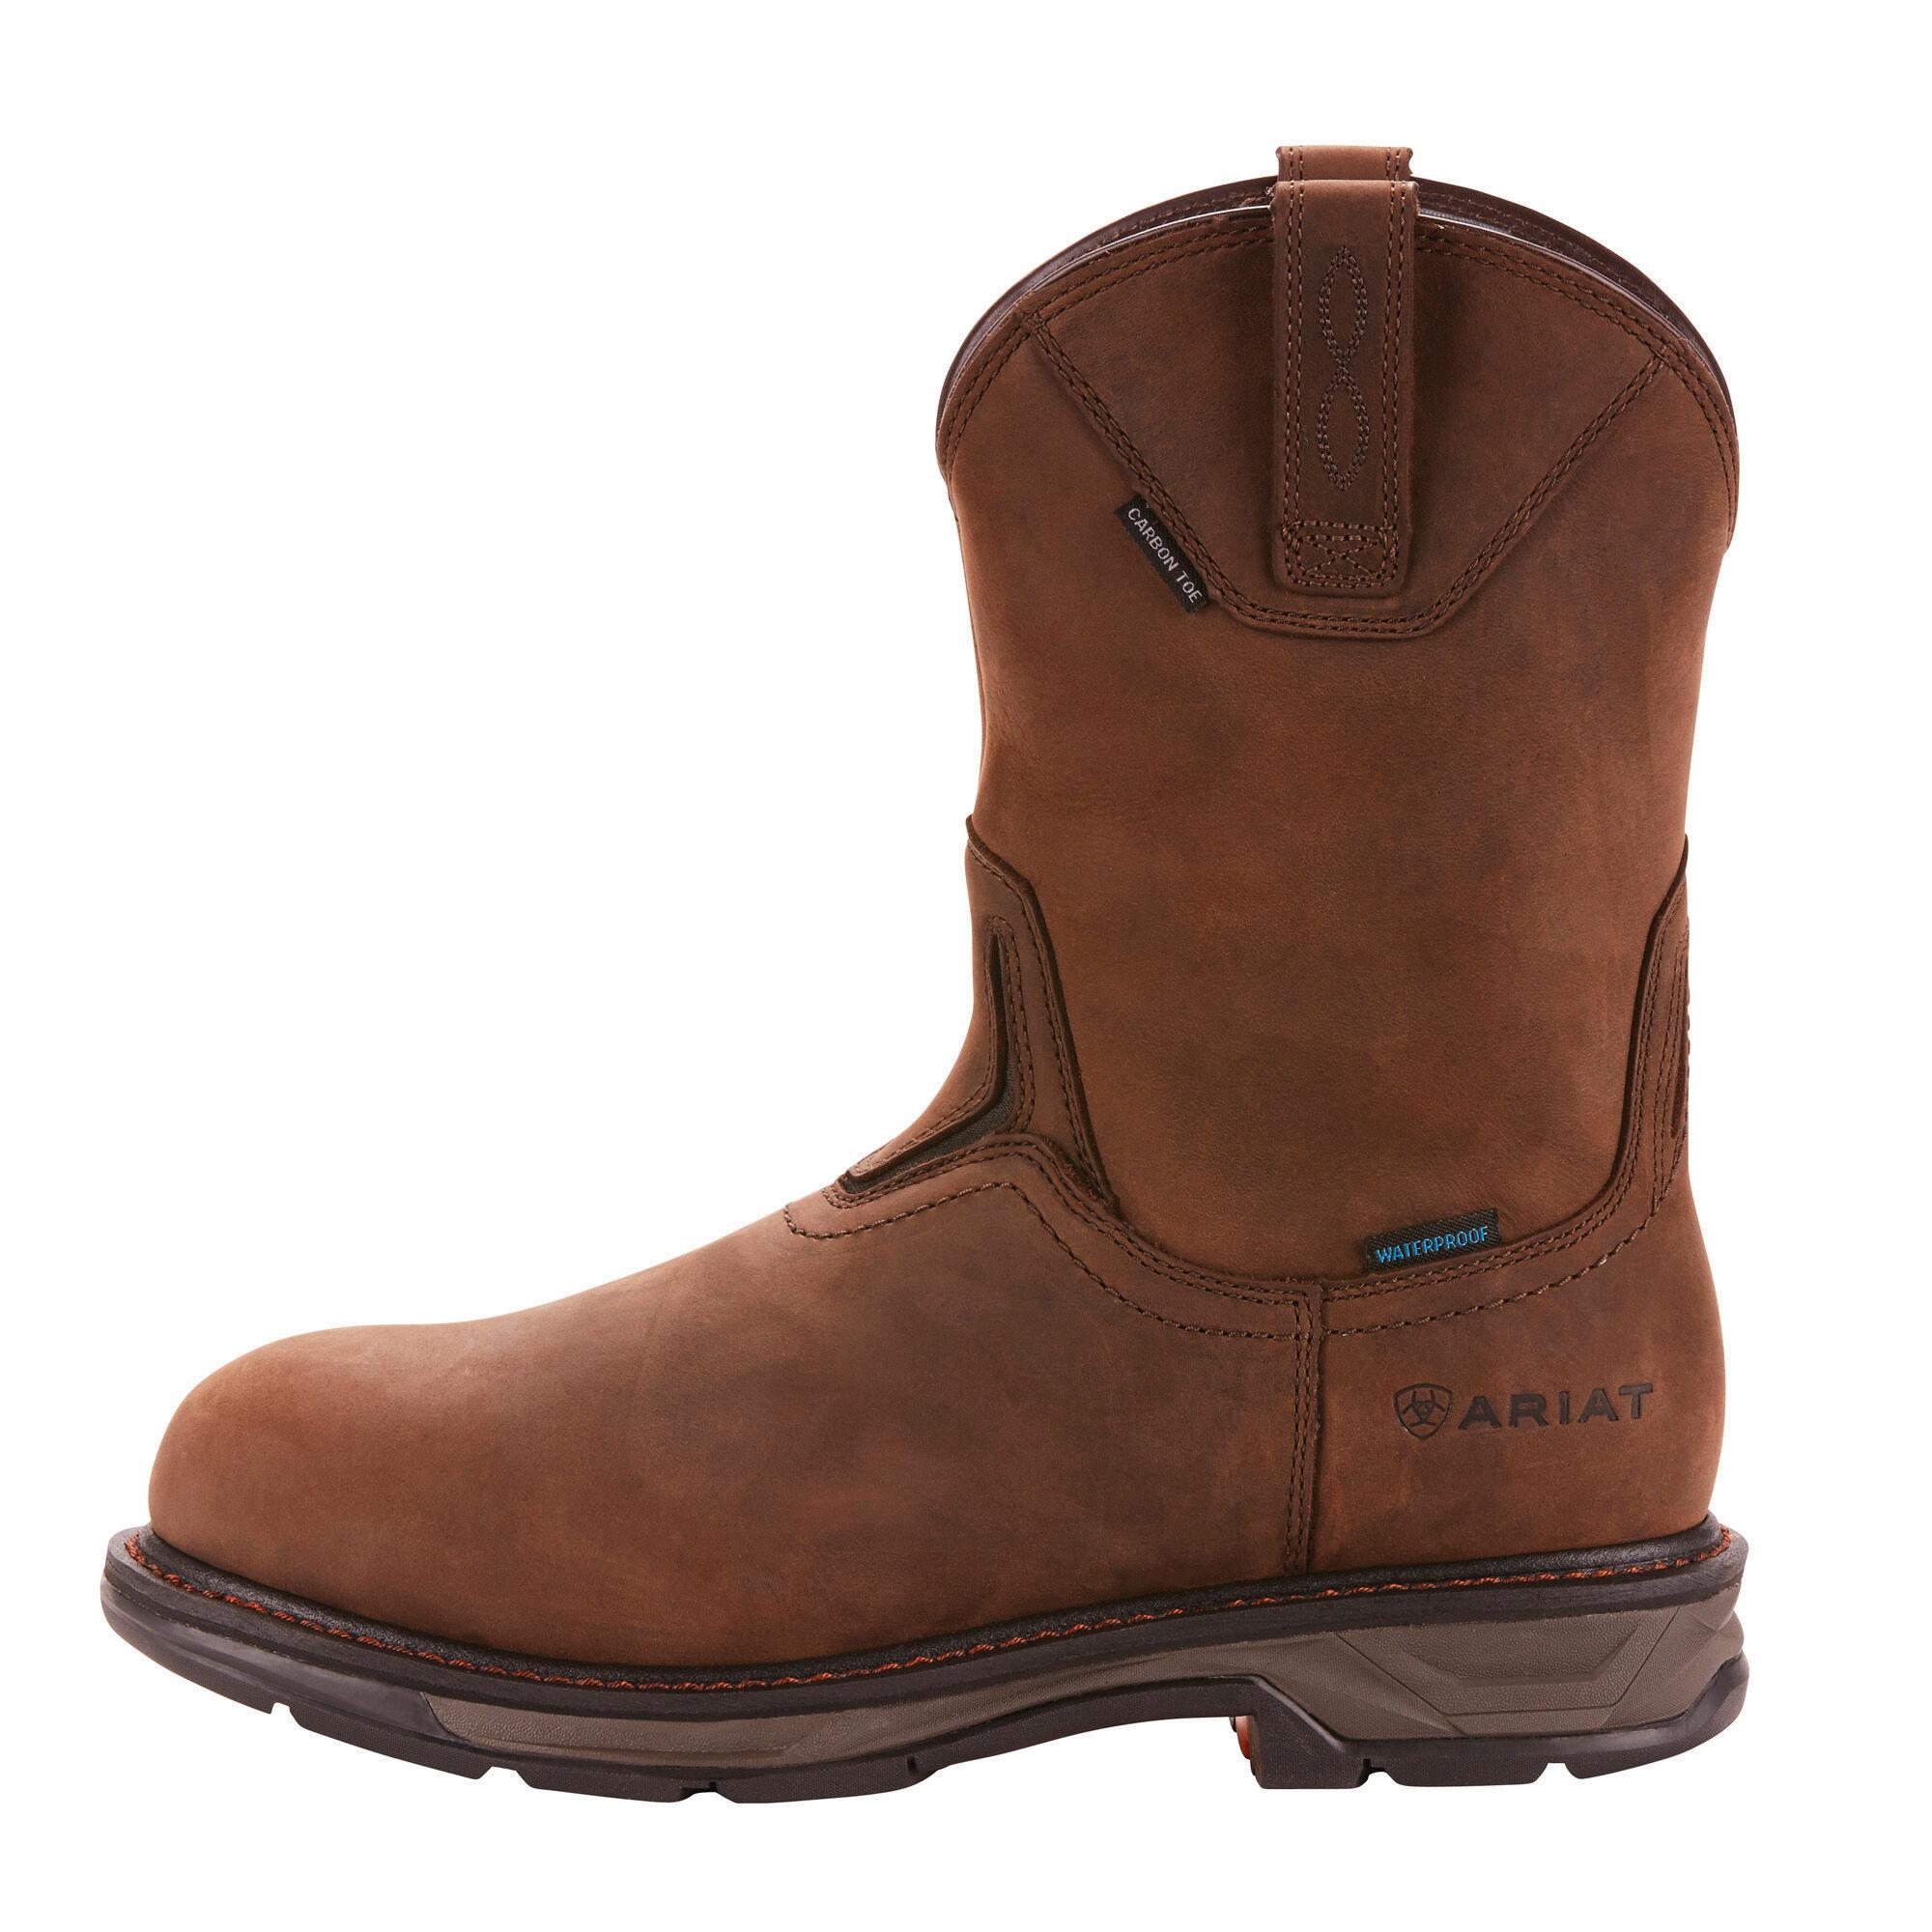 6415cd2ed98 WorkHog XT Wellington Waterproof Carbon Toe Work Boot